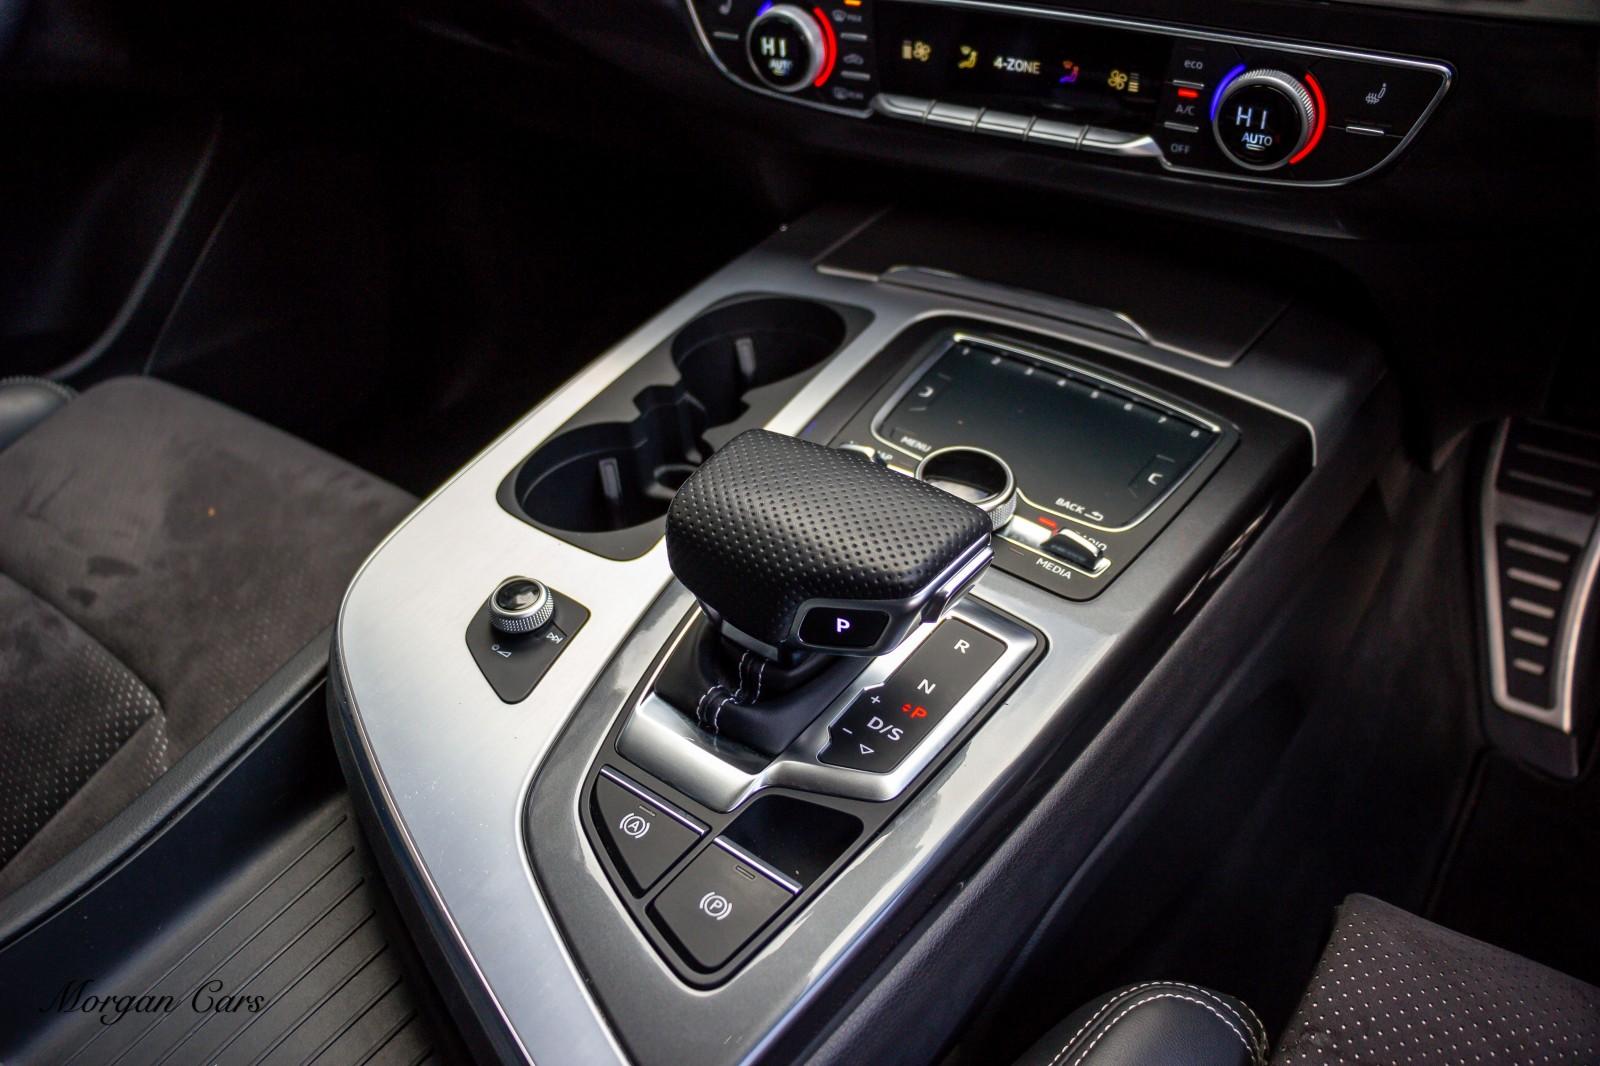 2018 Audi Q7 3.0 TDI QUATTRO S LINE Diesel Automatic – Morgan Cars 9 Mound Road, Warrenpoint, Newry BT34 3LW, UK full